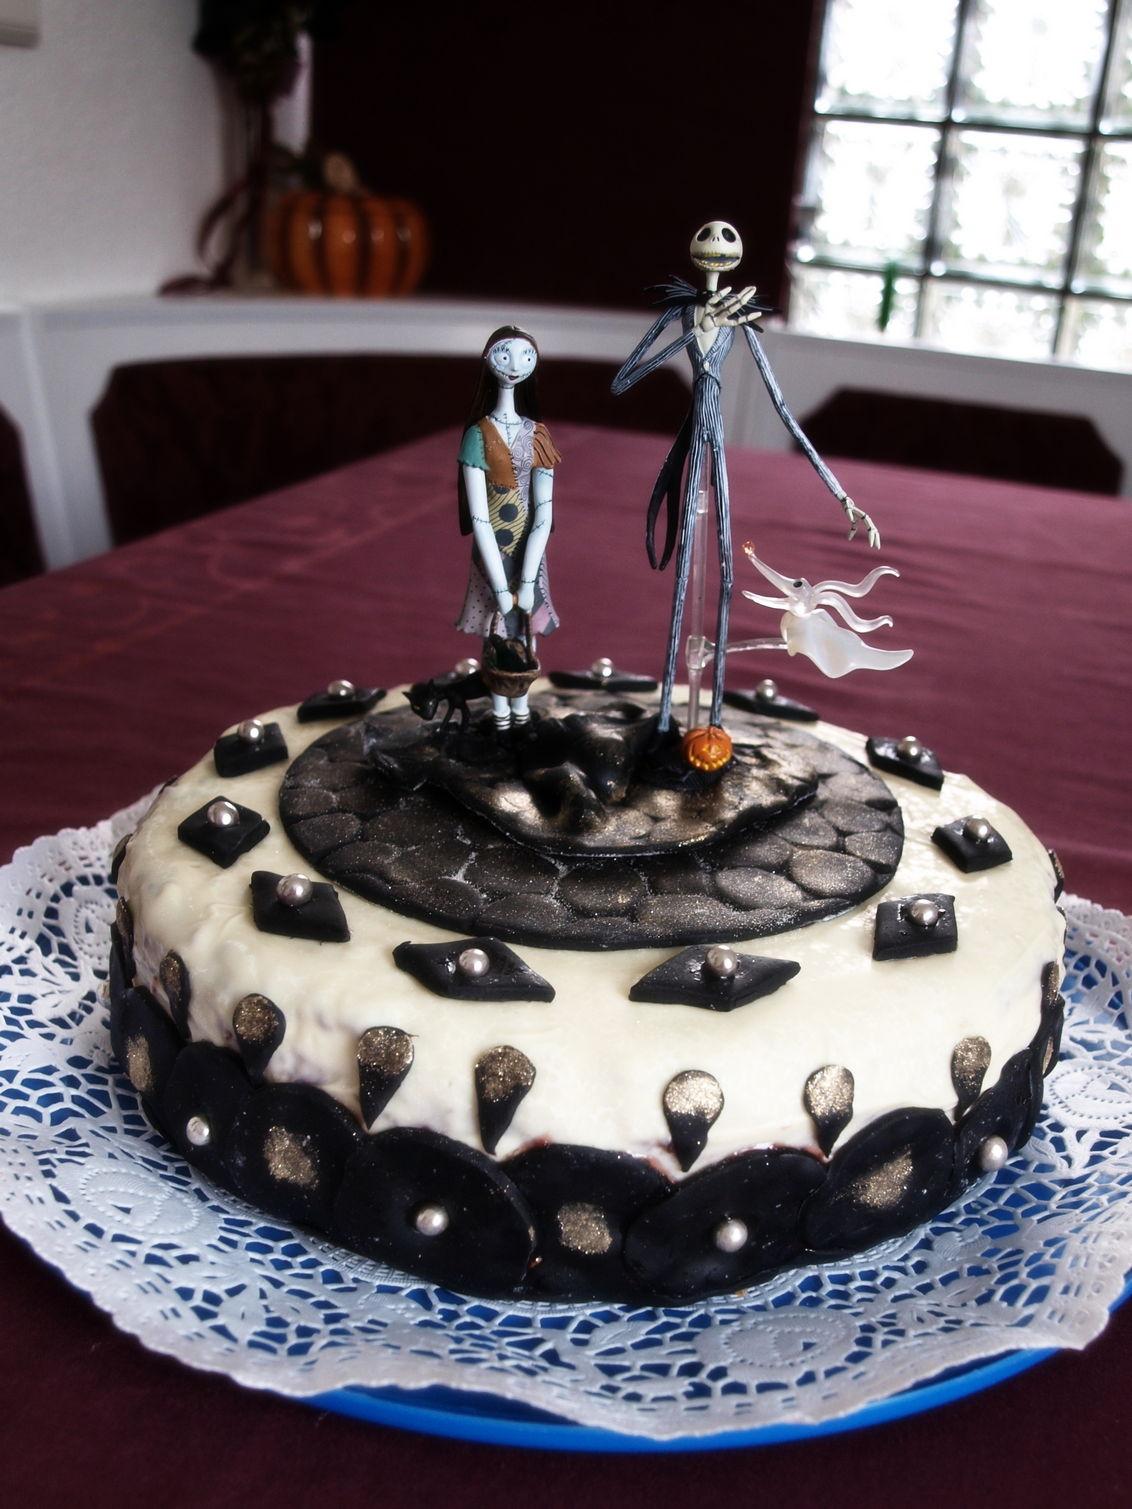 Nightmare Before Christmas Cake By Shelter2030 On Deviantart